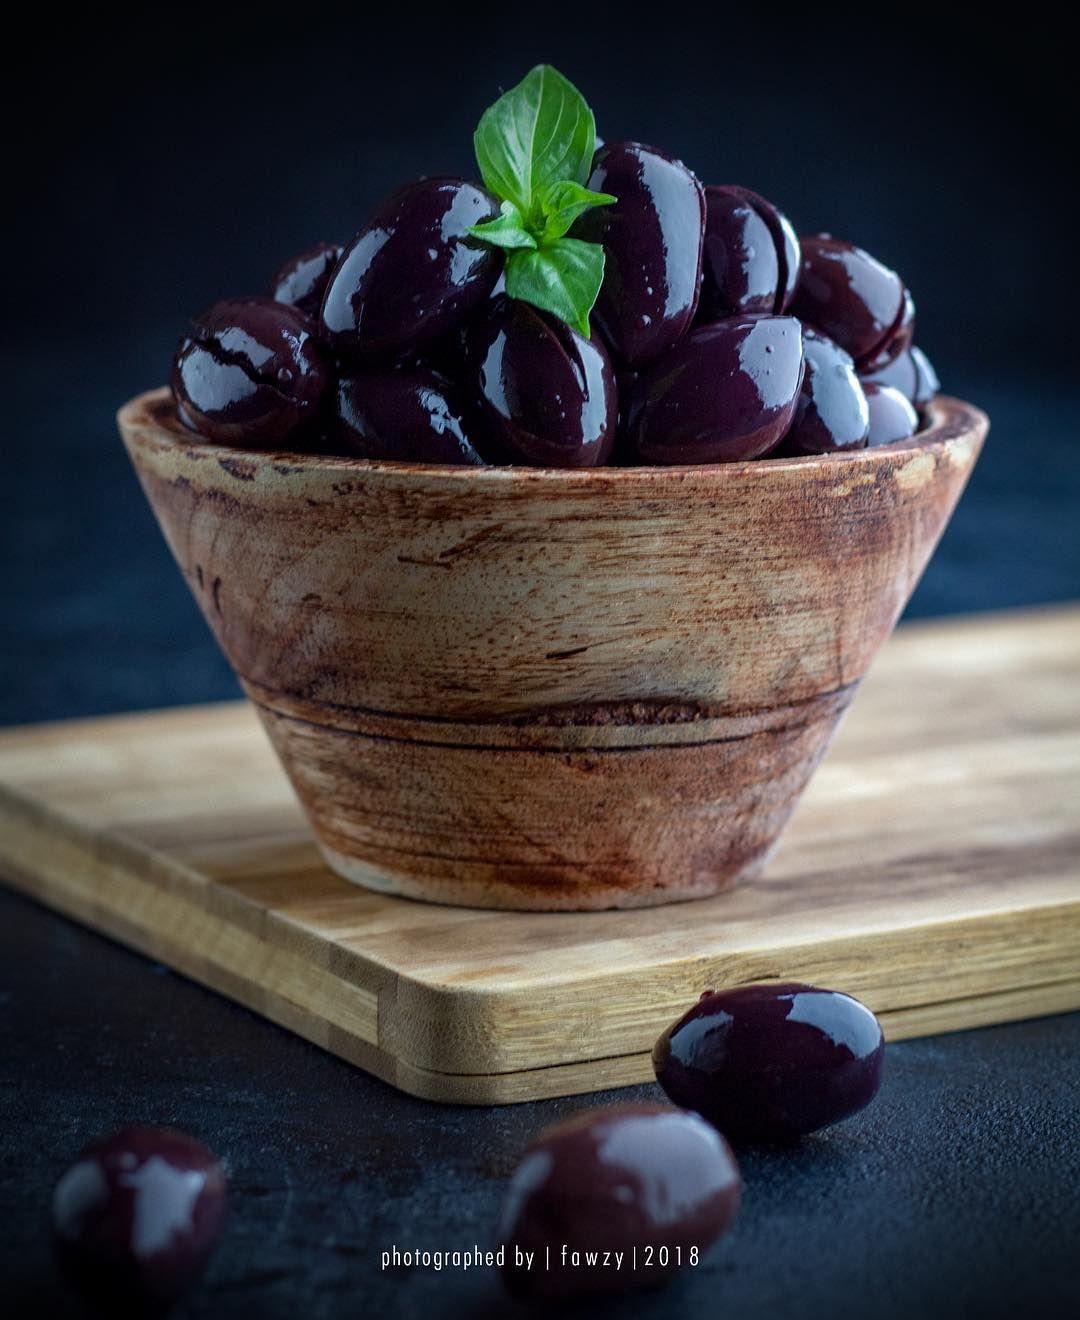 زتون كلاتاتا زيتون زيتون كلاماتا زيتون كلاماتا Olves Oil Oil Olves Foodstagram Foodphotography Fodphotographe In 2020 Food Photography Food Vegan Recipes